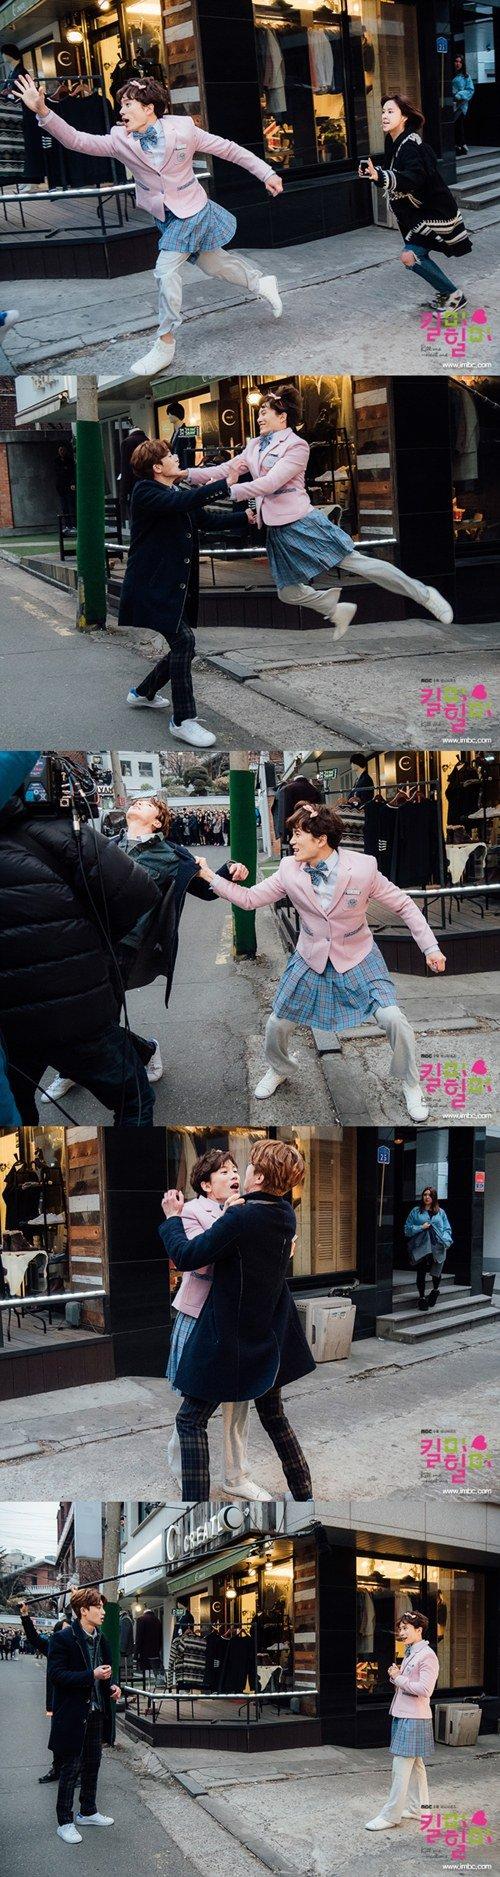 hwang jung eum and park seo joon relationship questions